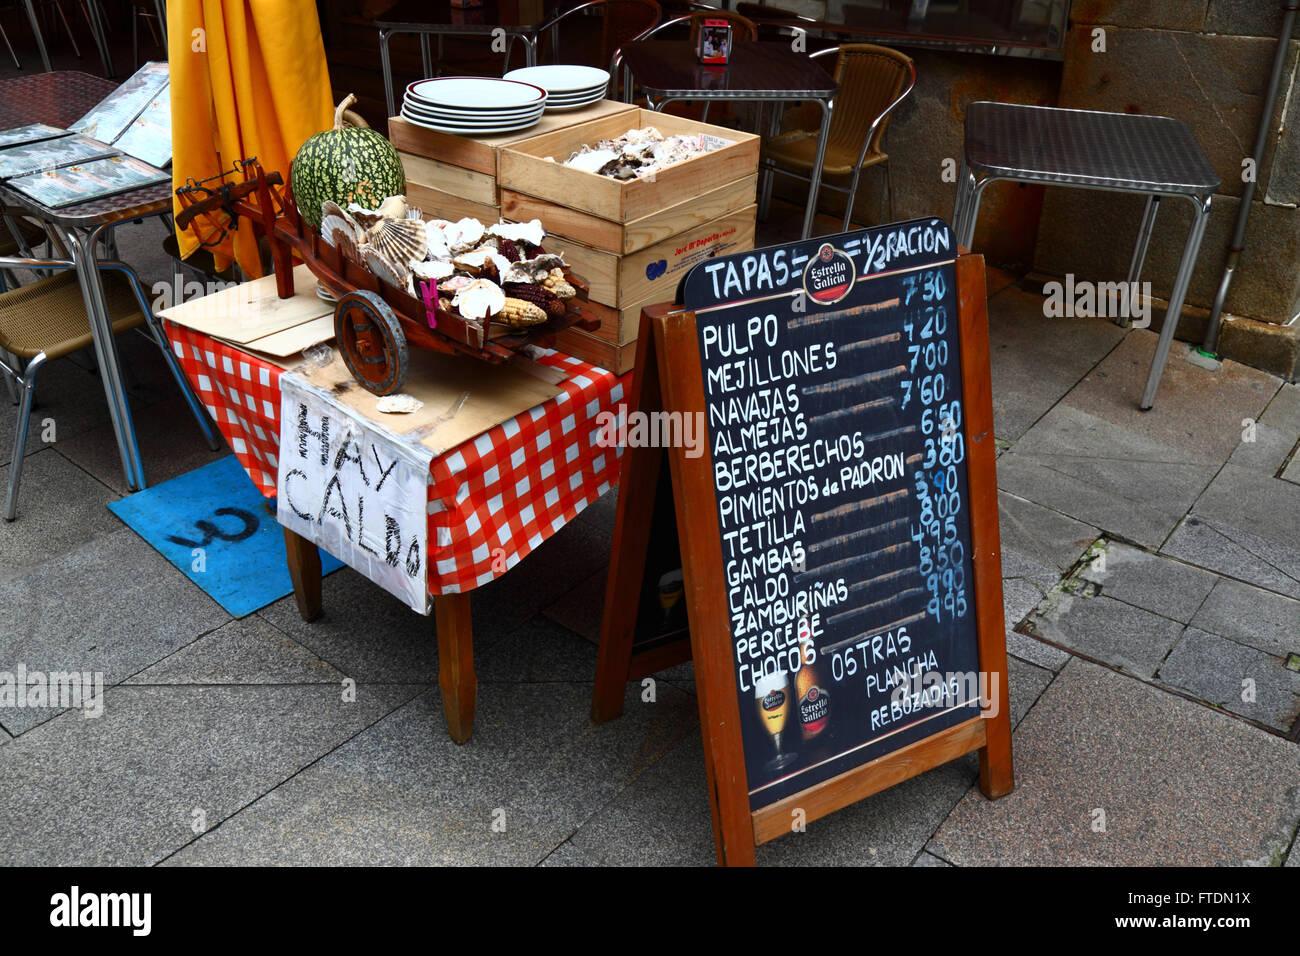 Spanish language menu with prices in Euros outside typical seafood restaurant / cafe, Vigo, Galicia, Spain Stock Photo